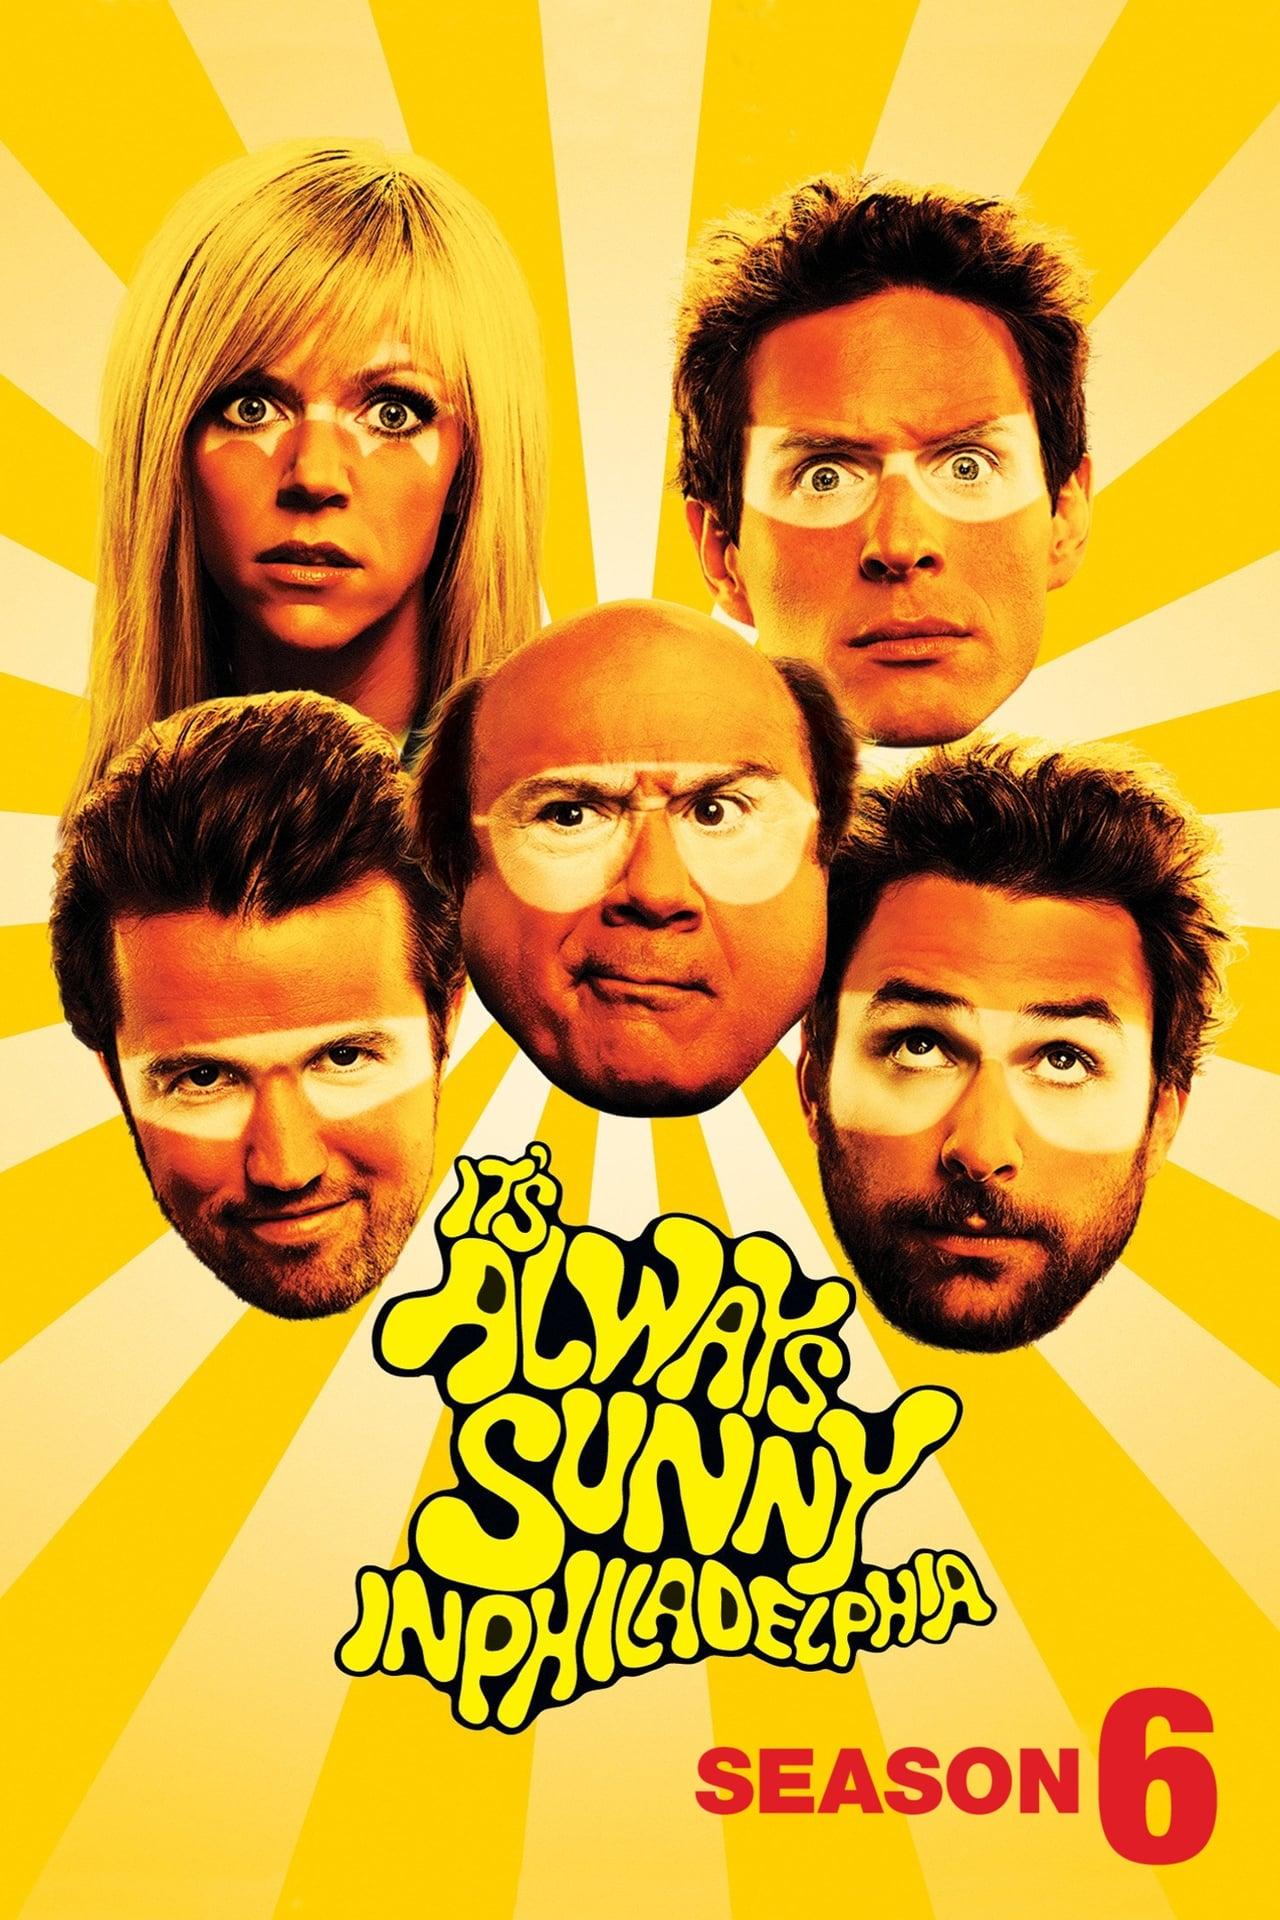 Putlocker It's Always Sunny In Philadelphia Season 6 (2010)